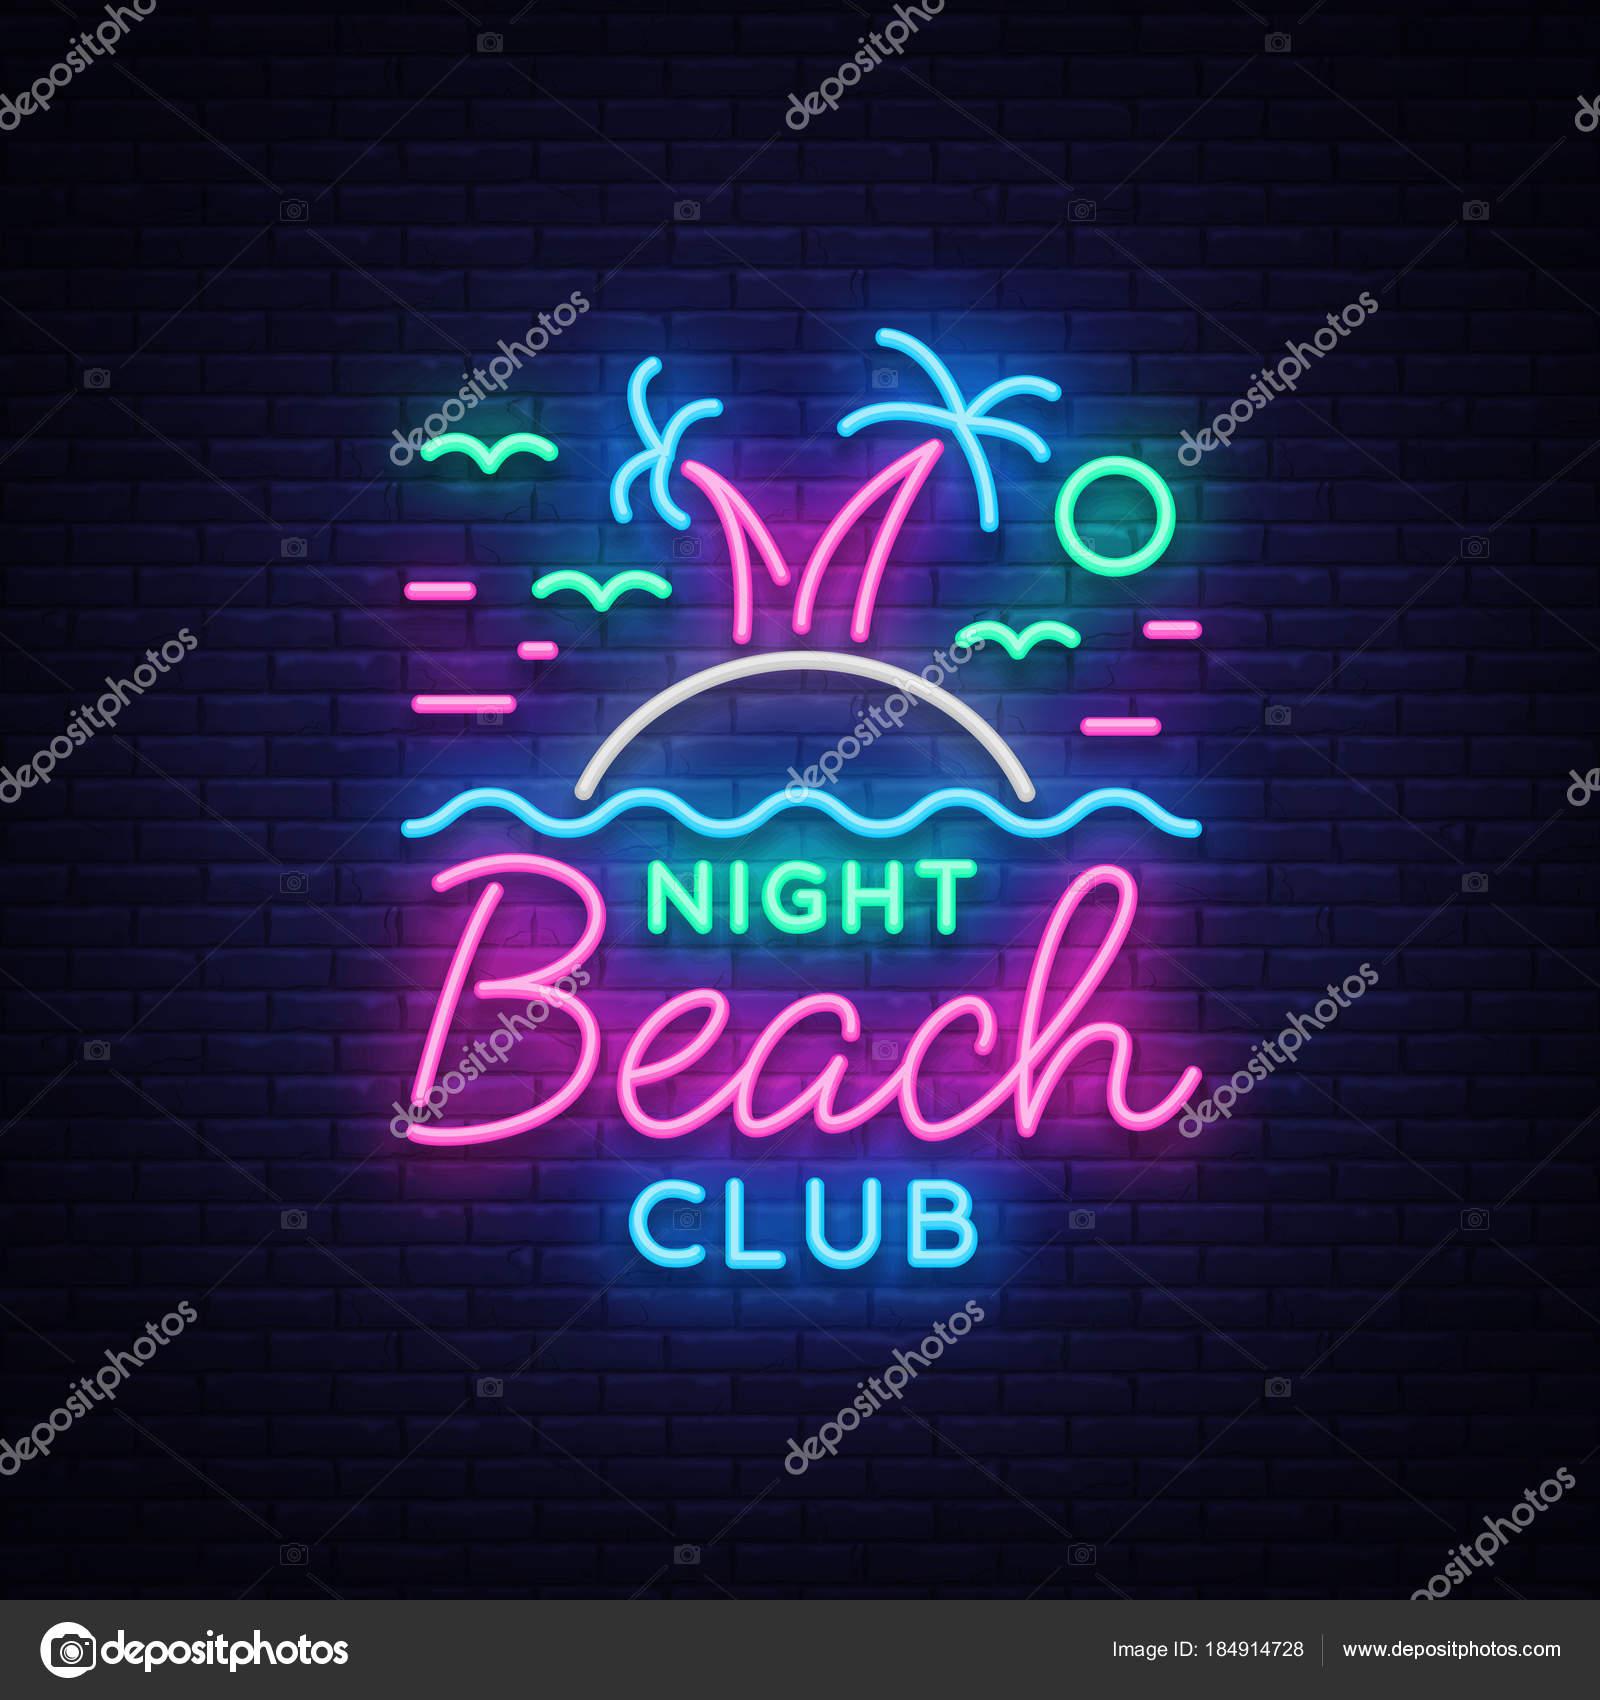 Beach nightclub neon sign logo in neon style symbol design beach nightclub neon sign logo in neon style symbol design template for nightclub night party advertising discos celebration buycottarizona Choice Image